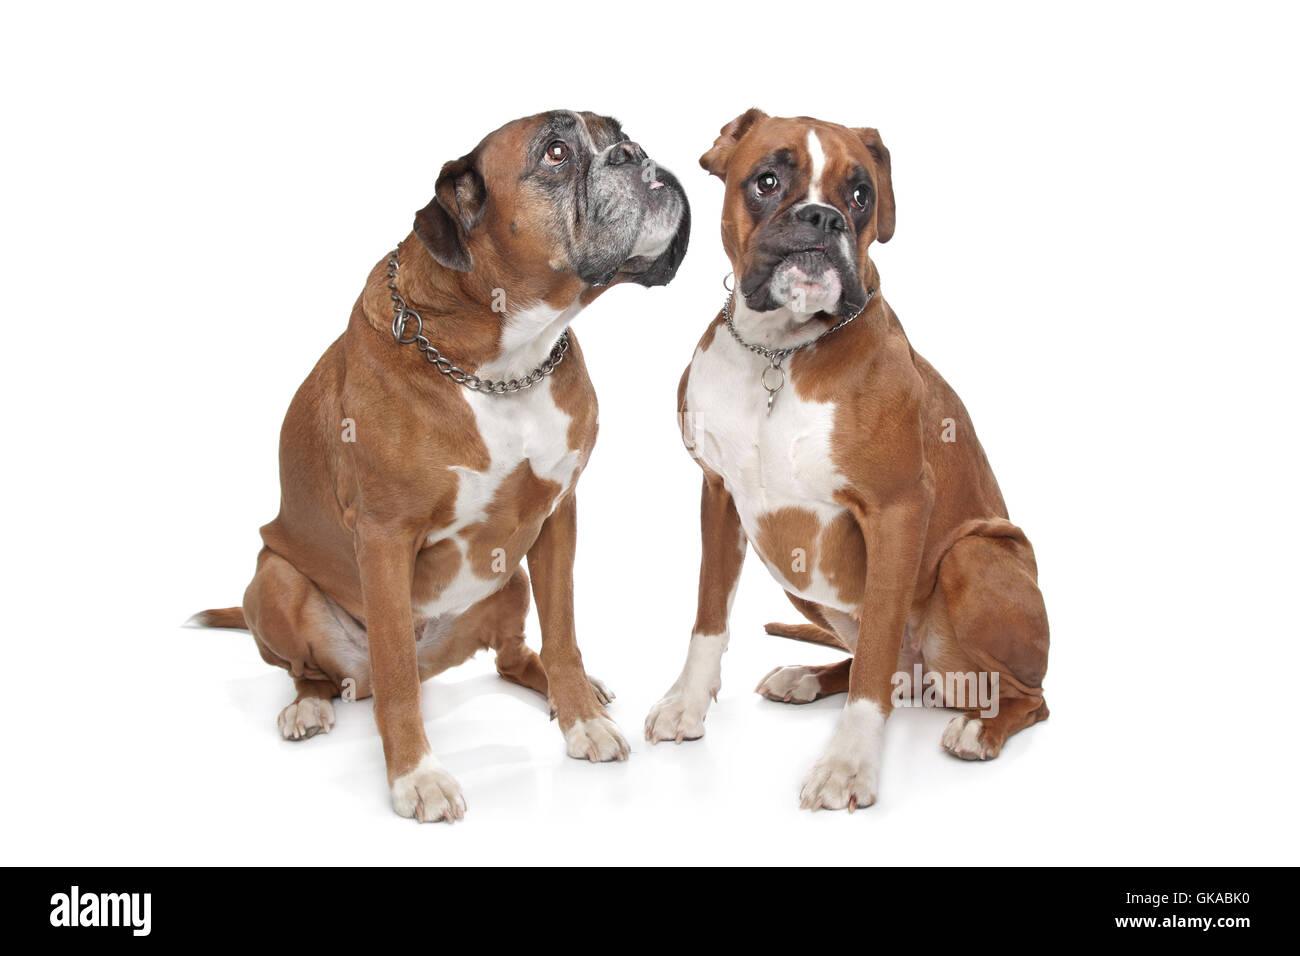 Fawn Boxer Stock Photos & Fawn Boxer Stock Images - Alamy